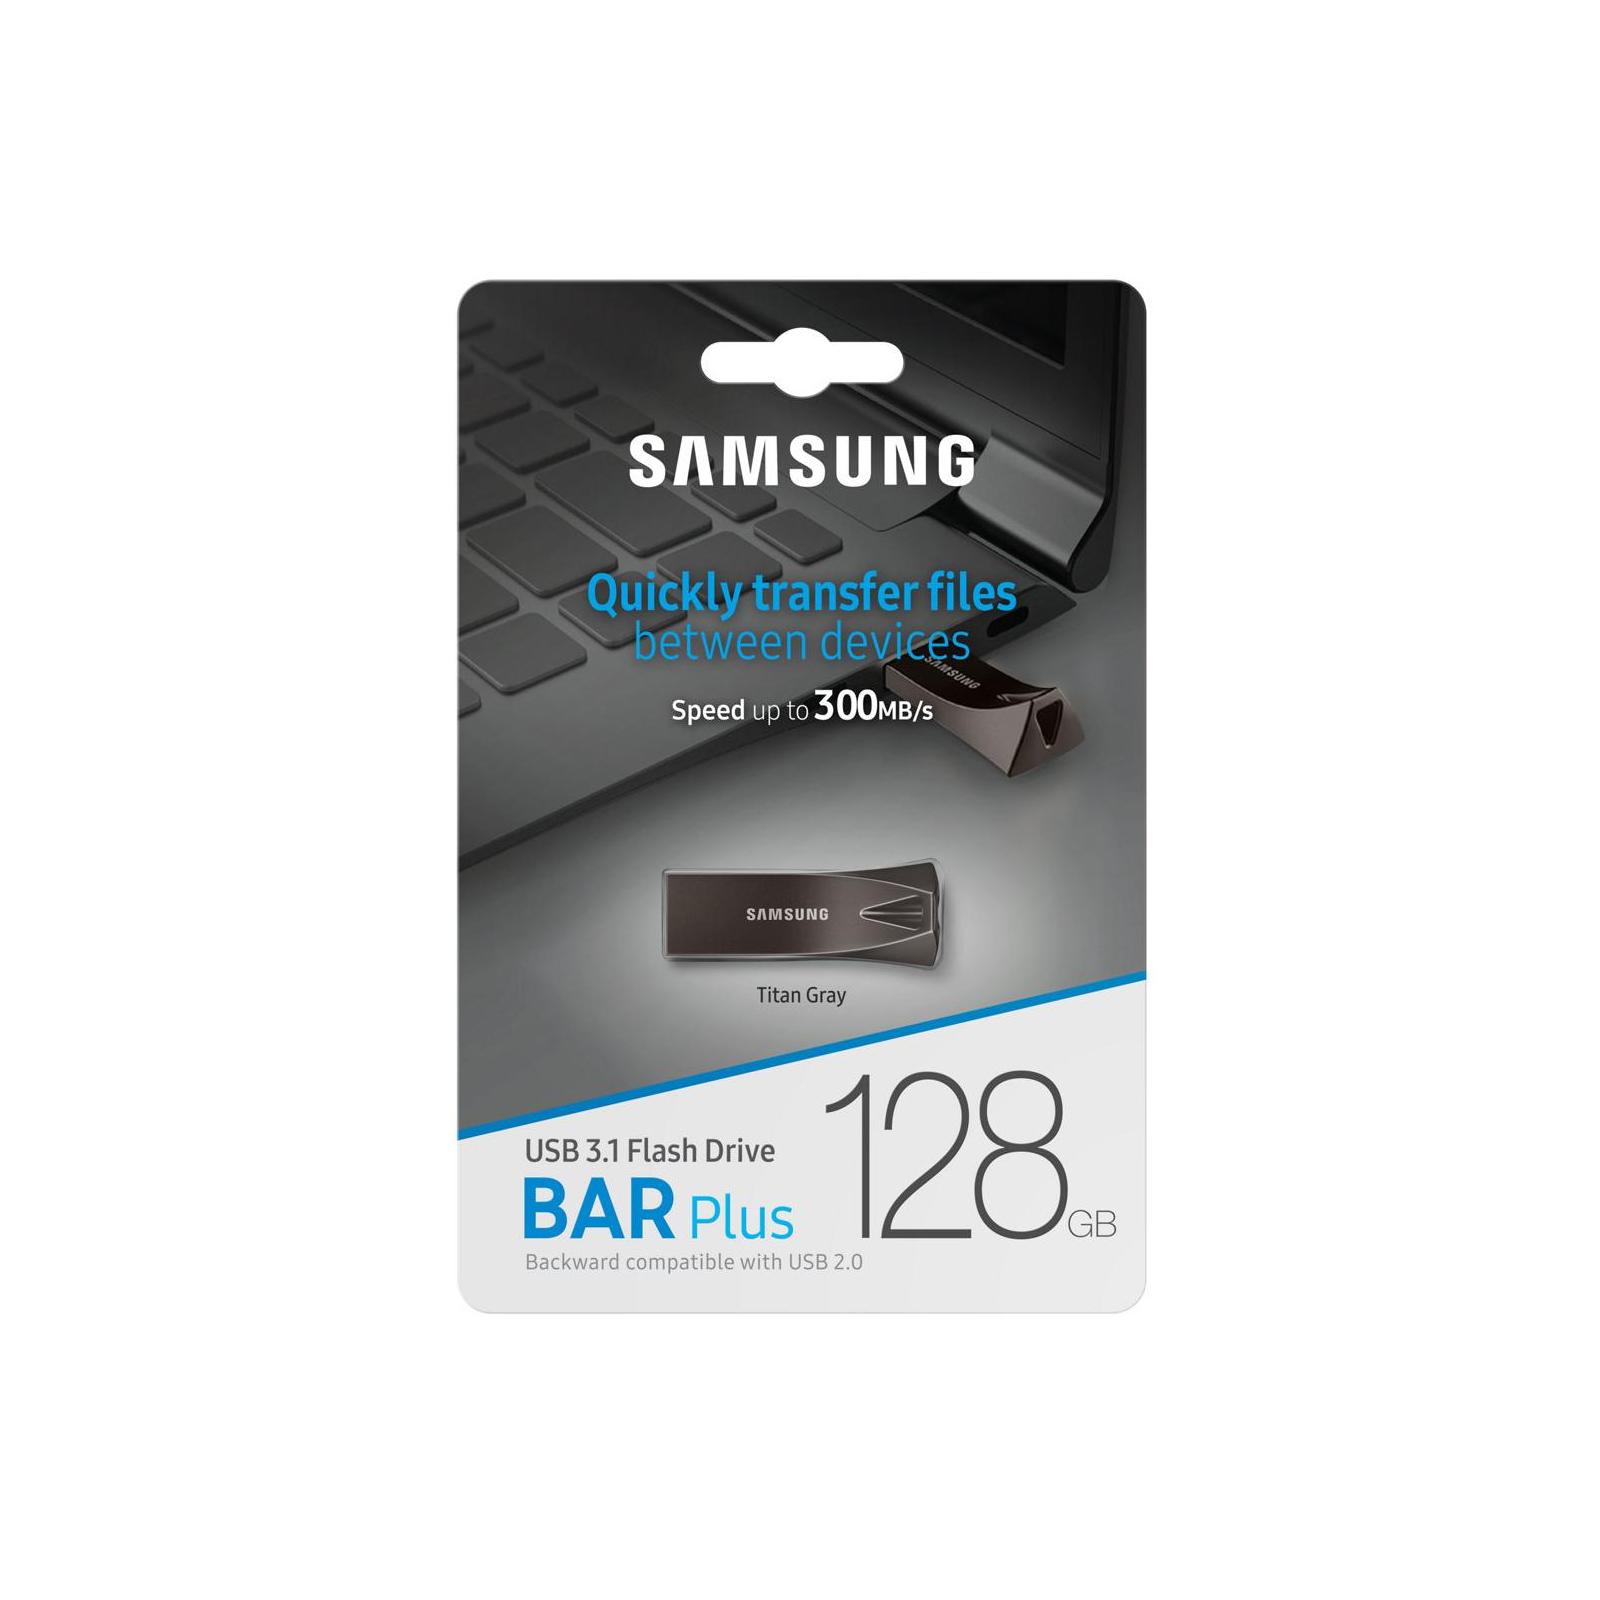 USB флеш накопитель Samsung 32GB Bar Plus Black USB 3.1 (MUF-32BE4/APC) изображение 7